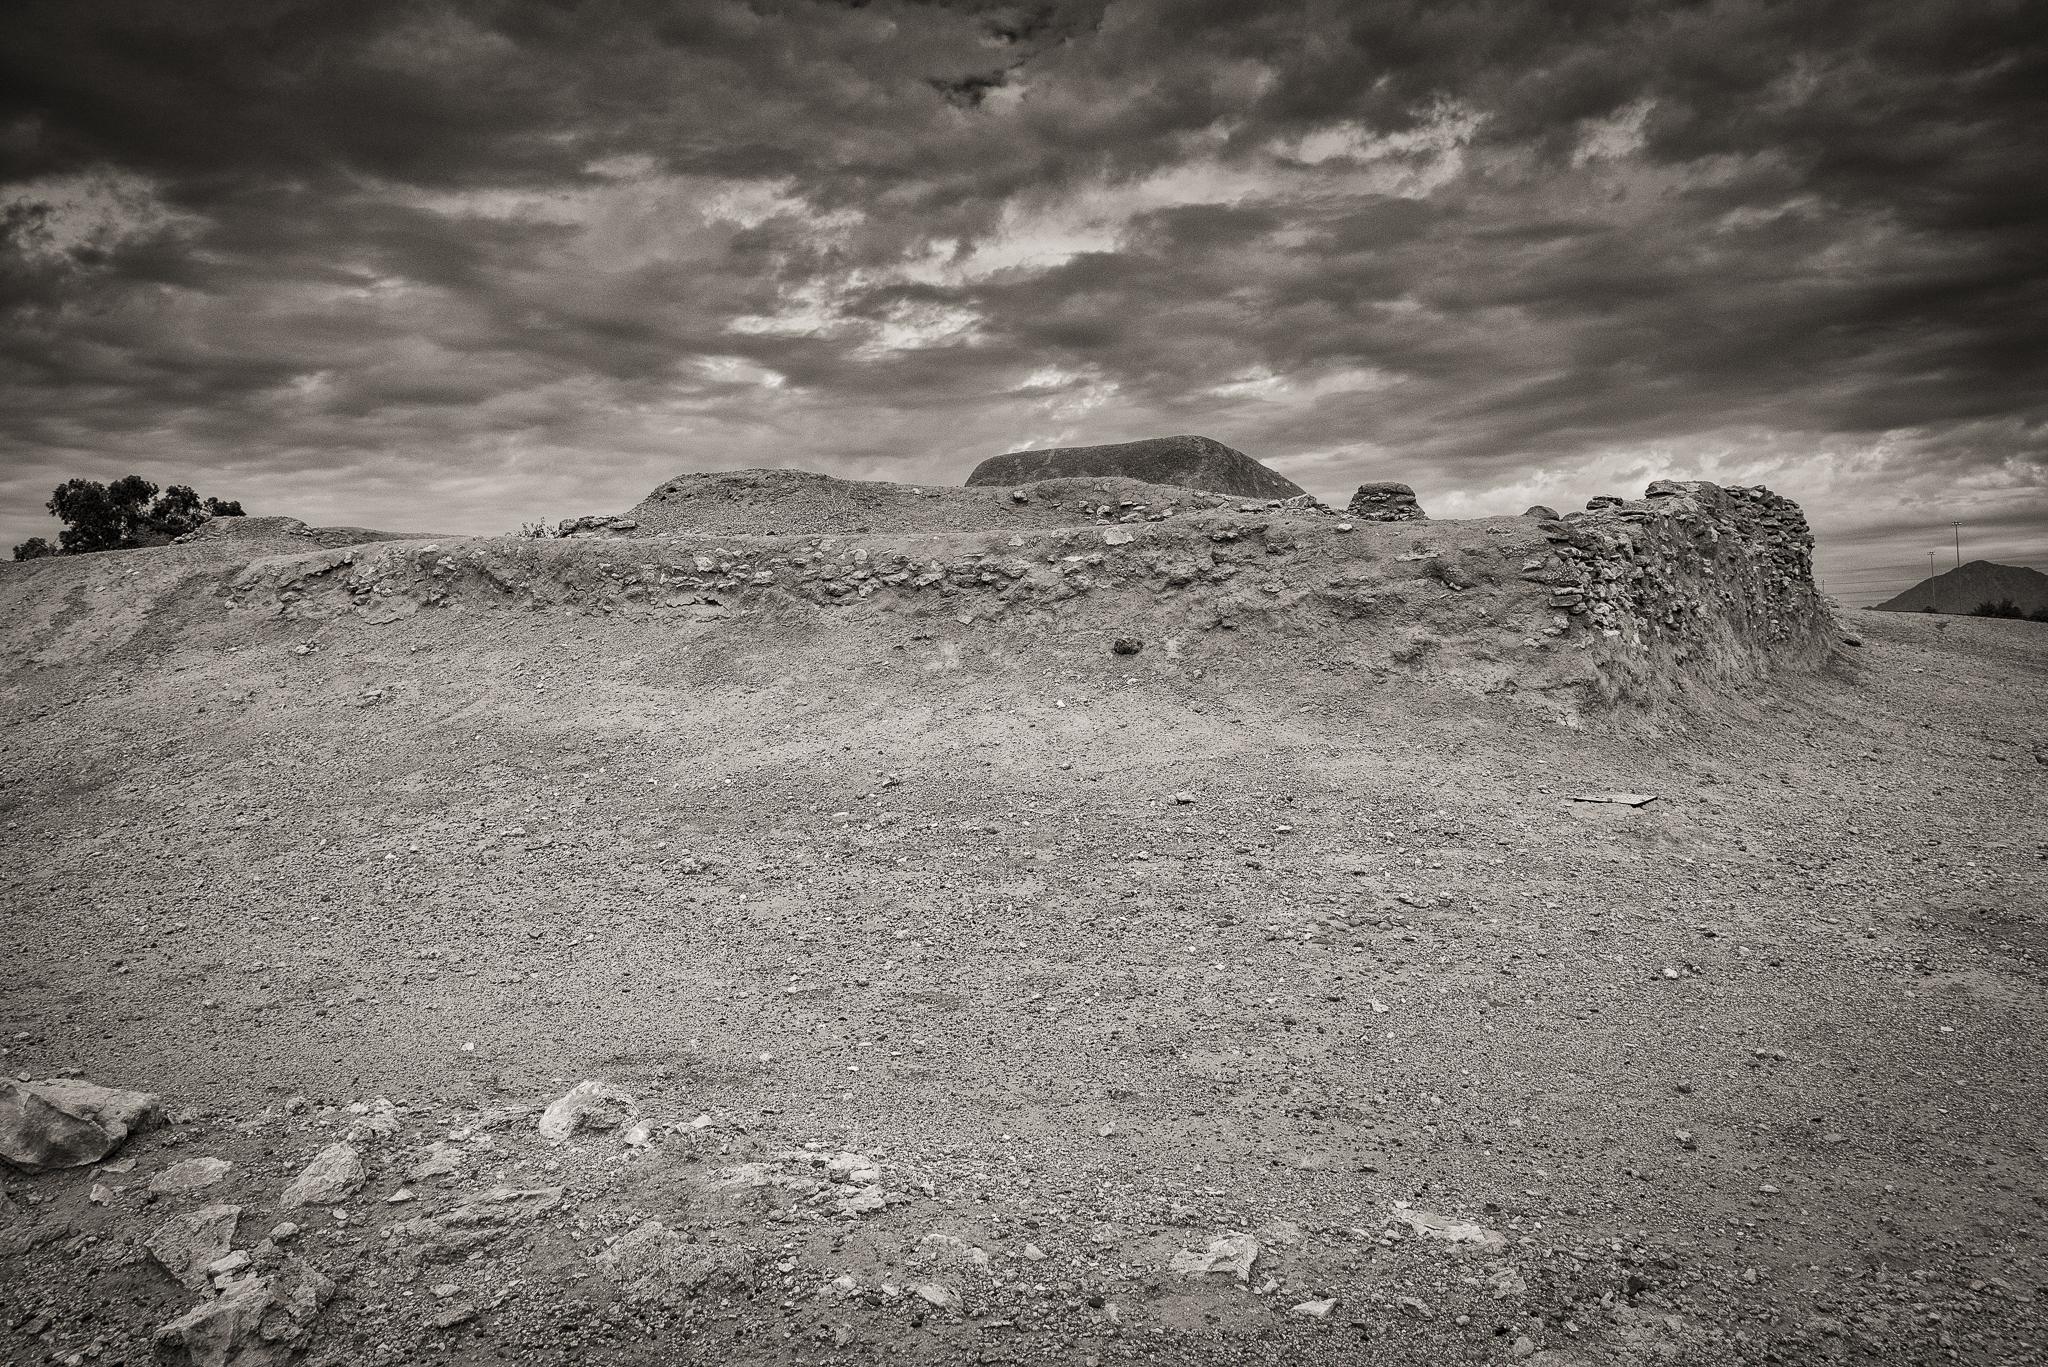 Pueblo Grande: Hohokam Platform Mound